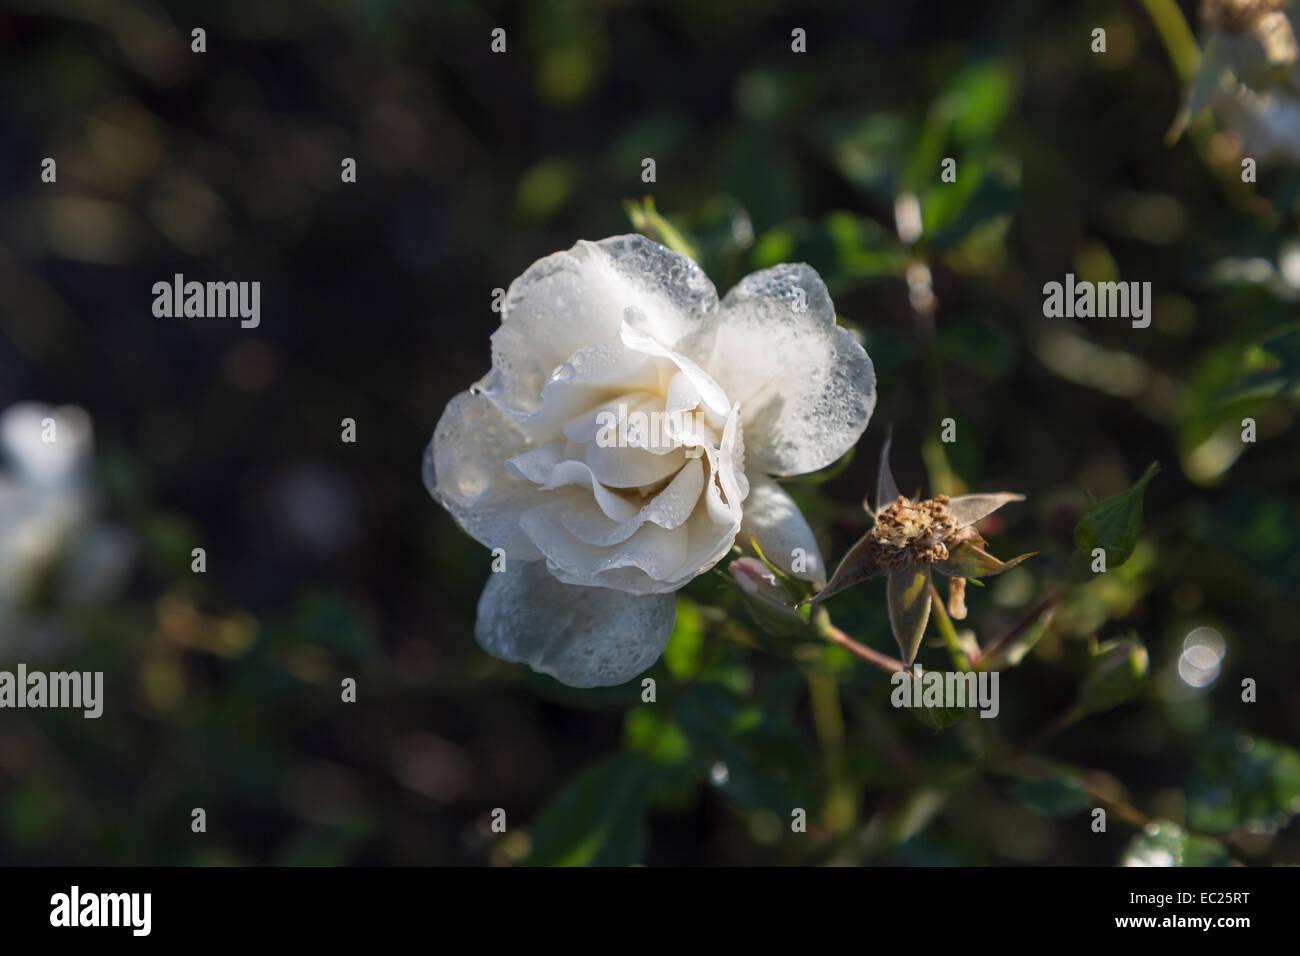 Flower carpet rose stock photos flower carpet rose stock images flower carpet white naoschnee a hardy white semi double ground cover rose mightylinksfo